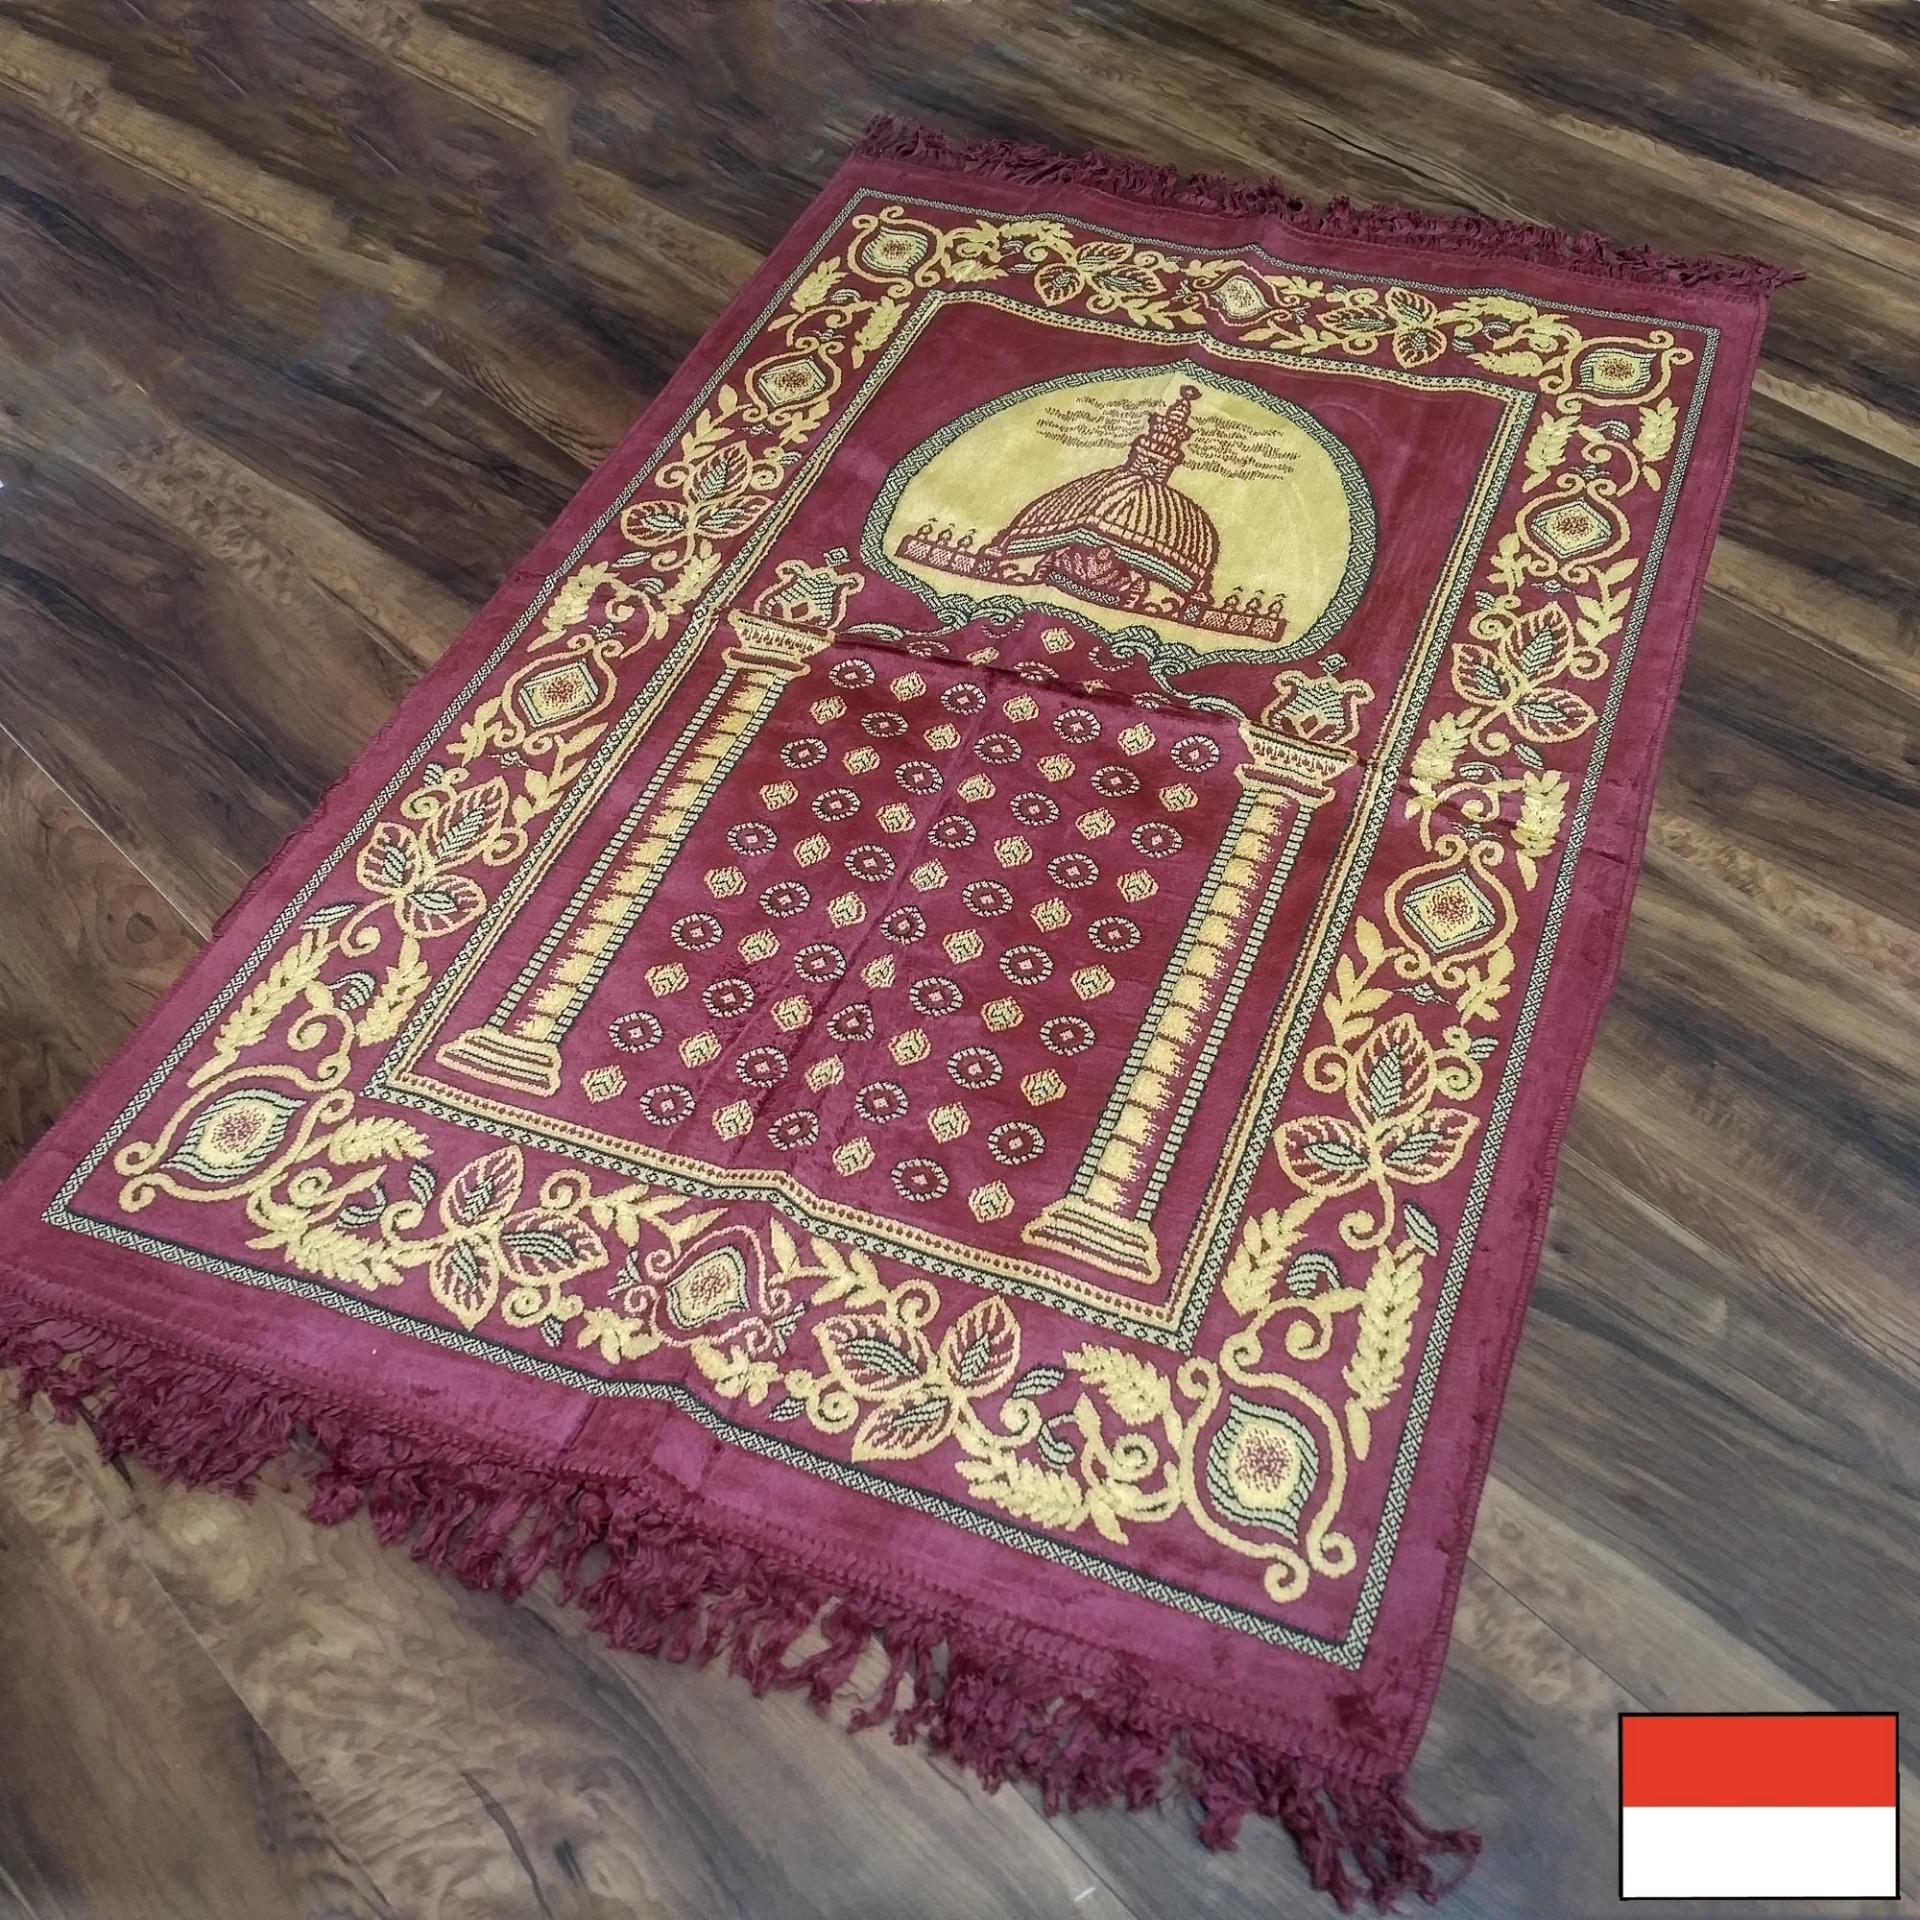 Al-Shiraz - Sajadah Turki Beludru / Bulu 68 cm x 110 cm - Maroon